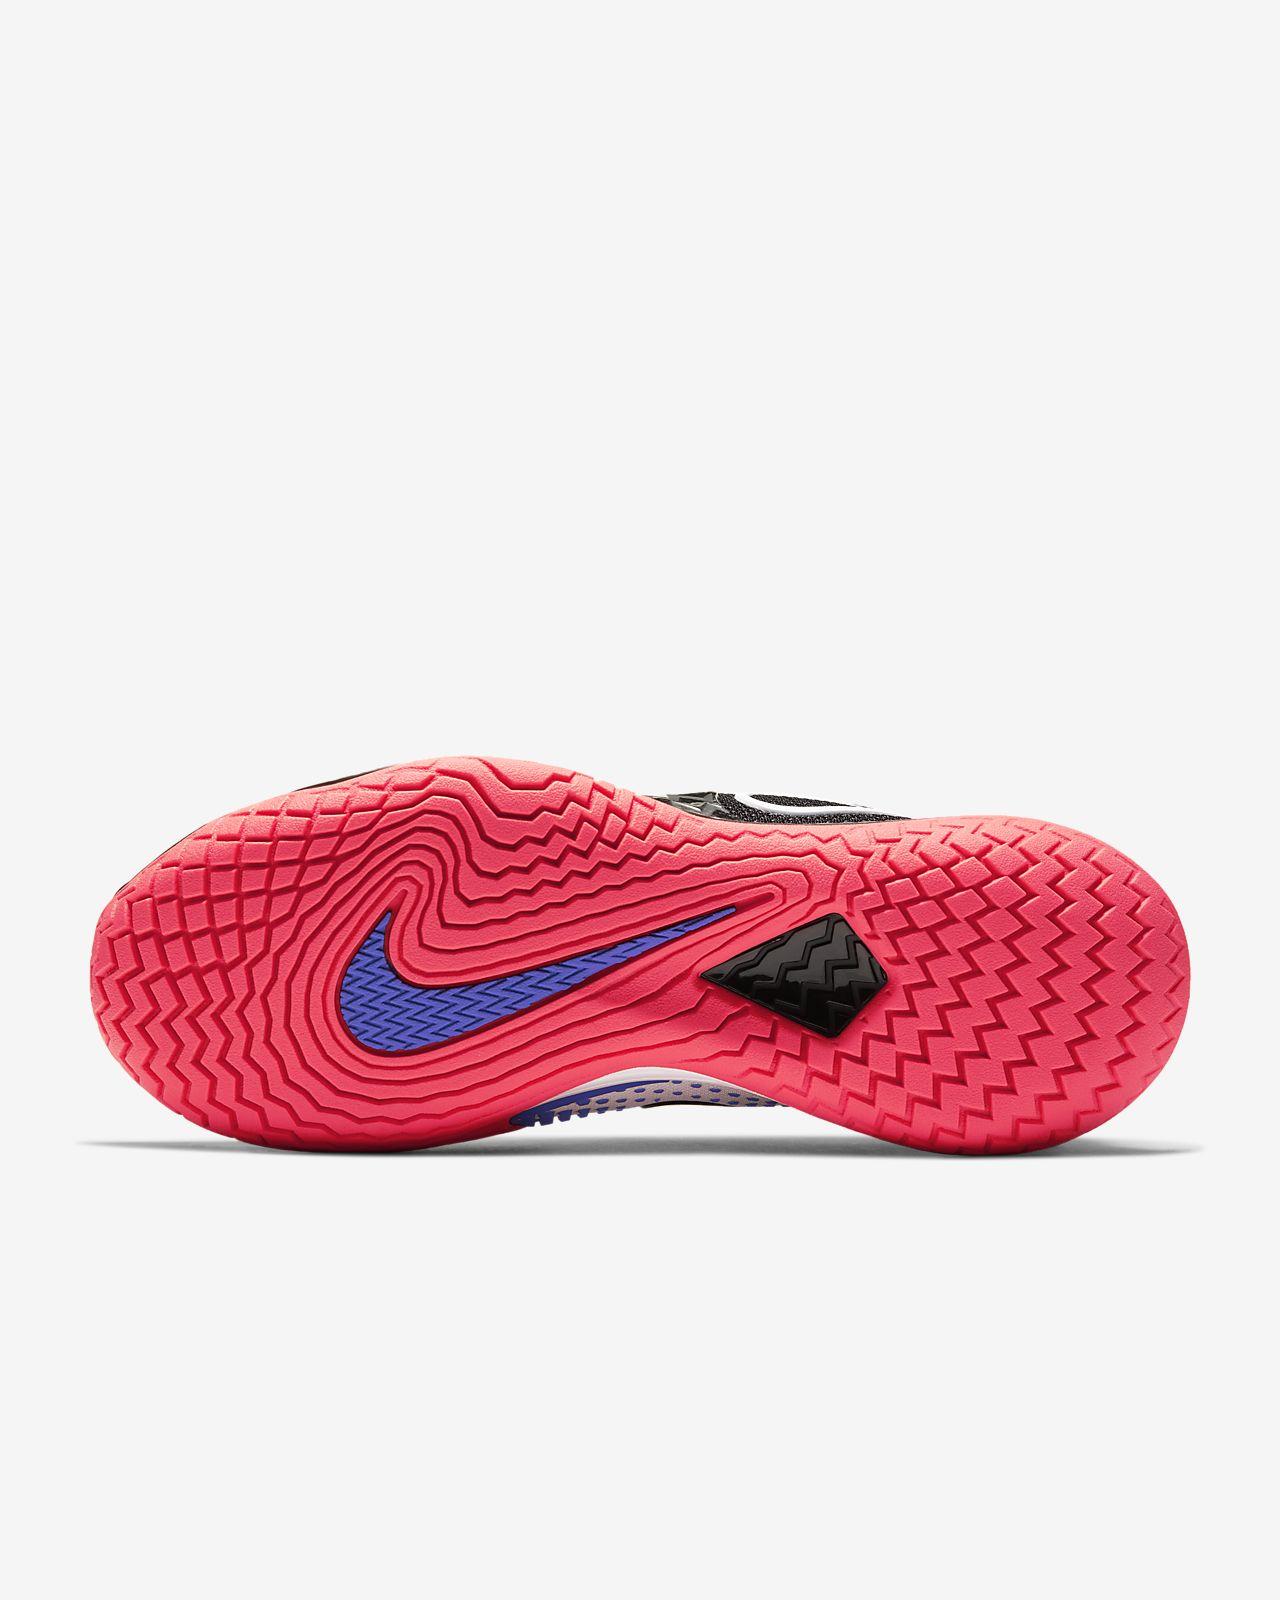 Nike vapor flash jacket | Nike vapor, Jackets, Athletic gear